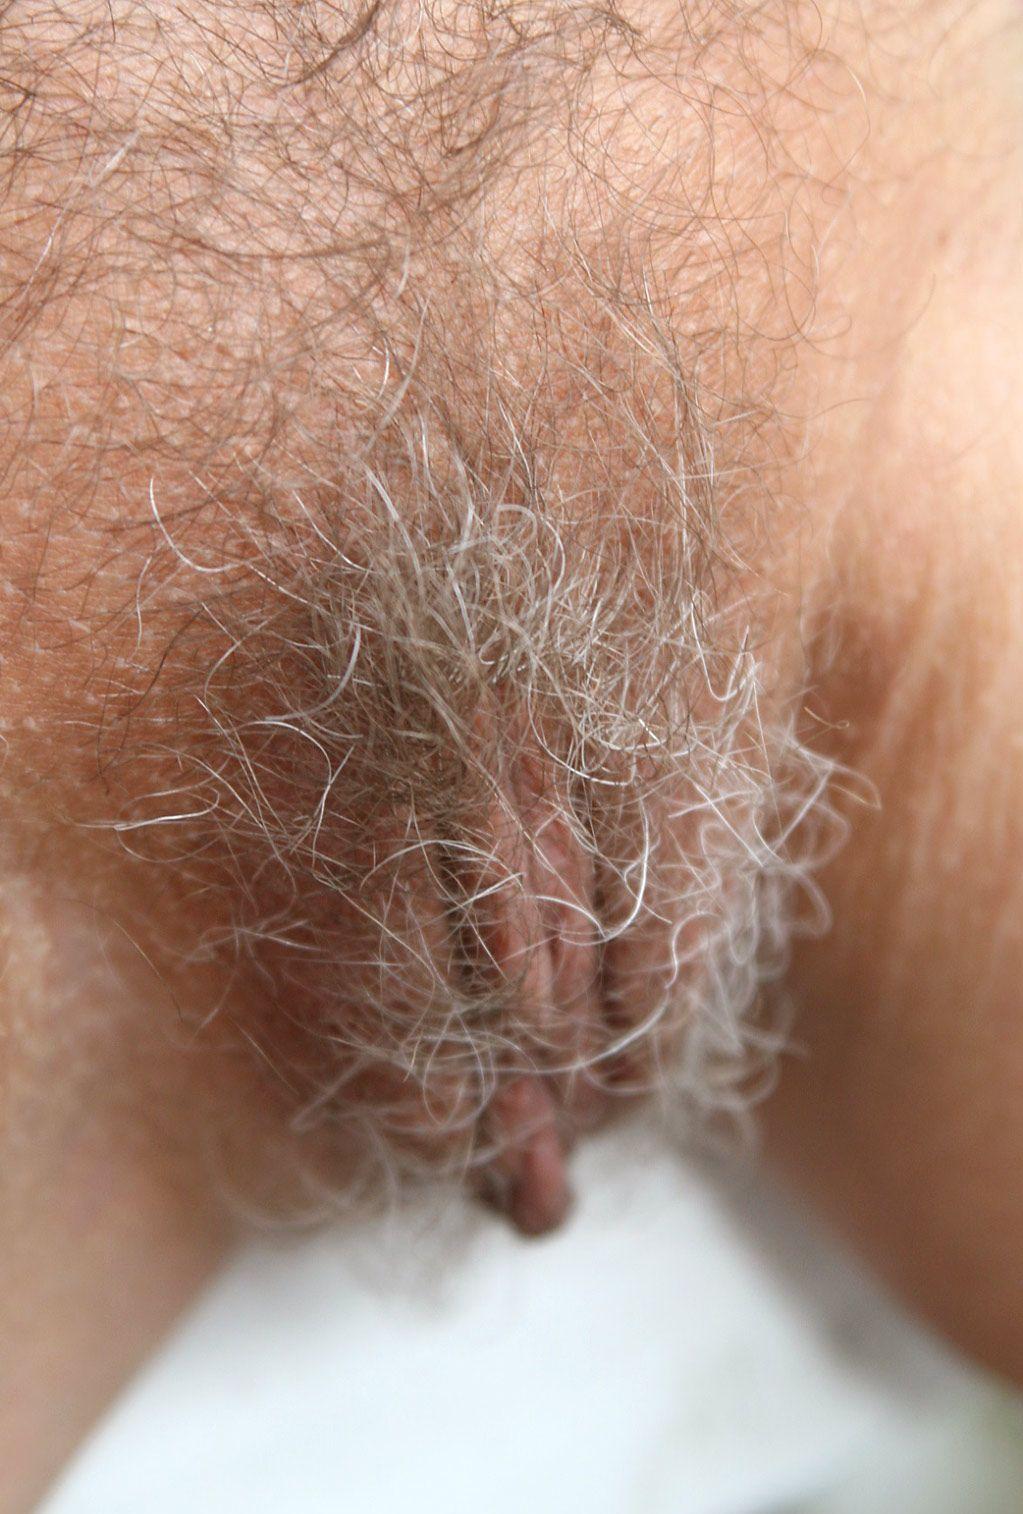 lubricate the anus